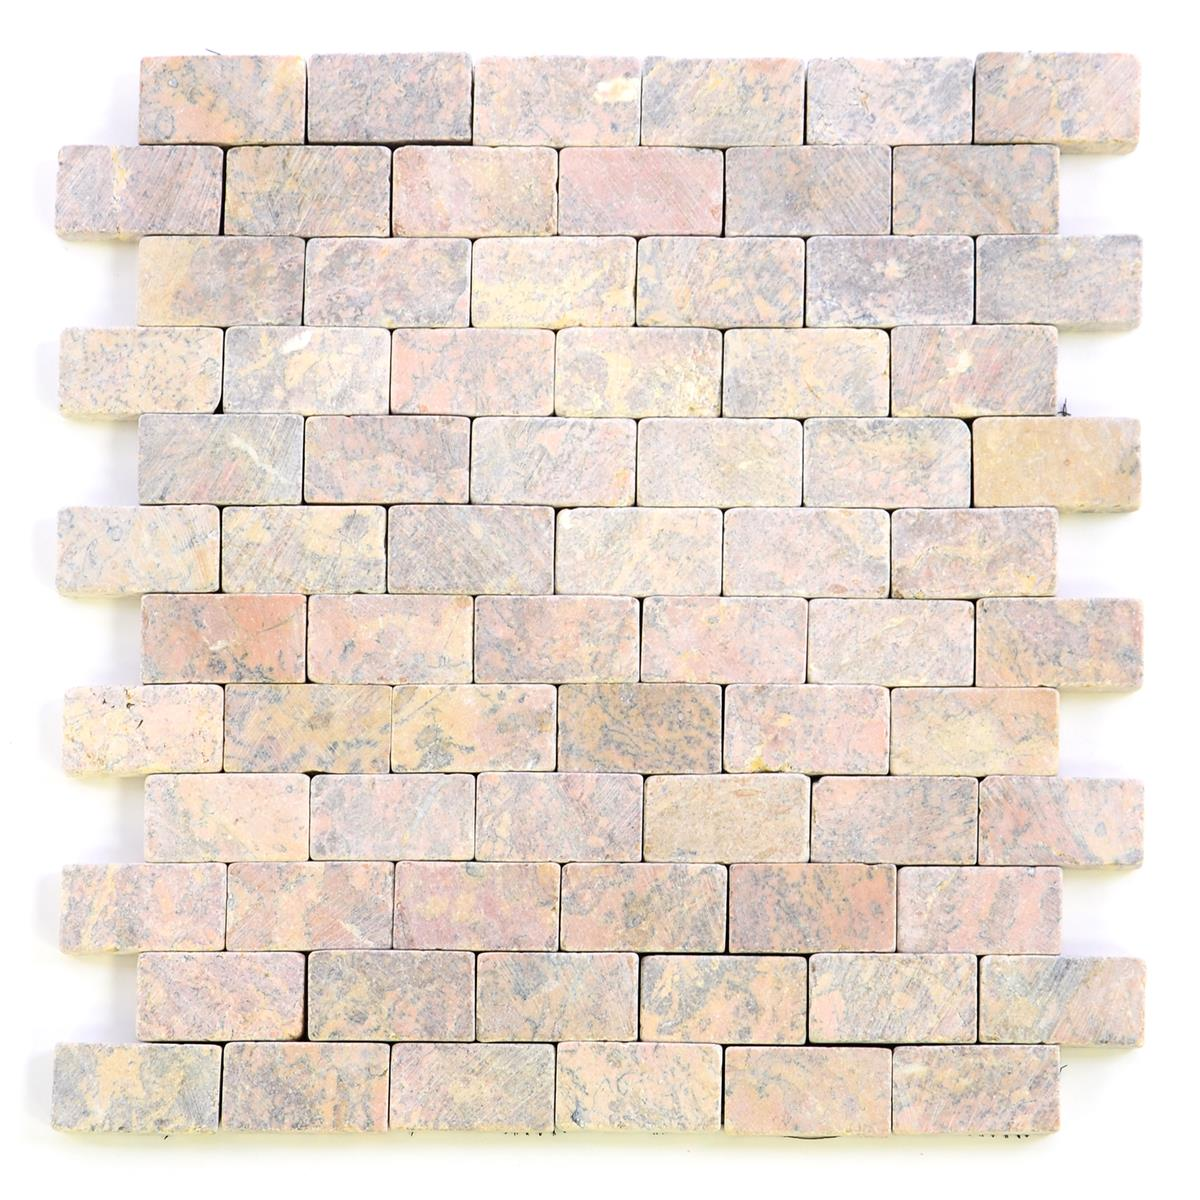 DIVERO 1 Fliesenmatte Stein Mosaik Marmor Wand Boden zartrosa 29x32cm